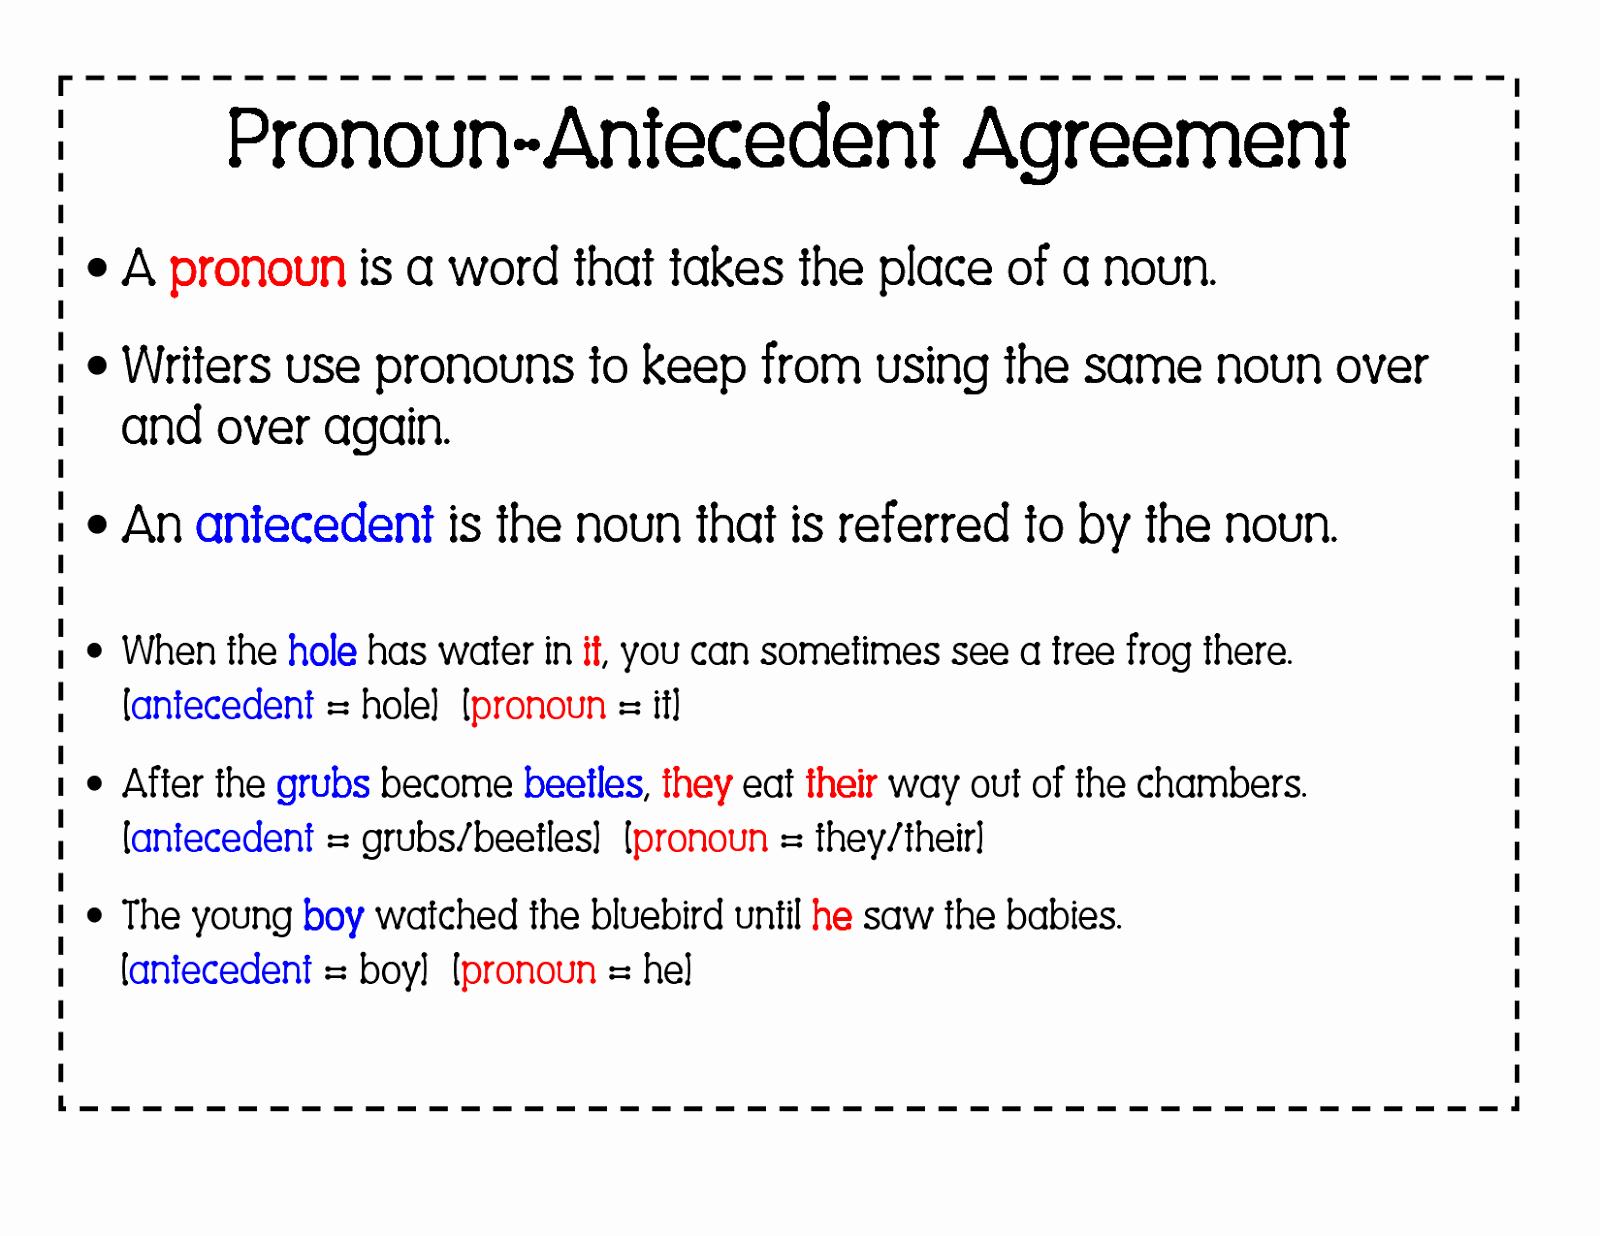 50 Pronoun Antecedent Agreement Worksheet